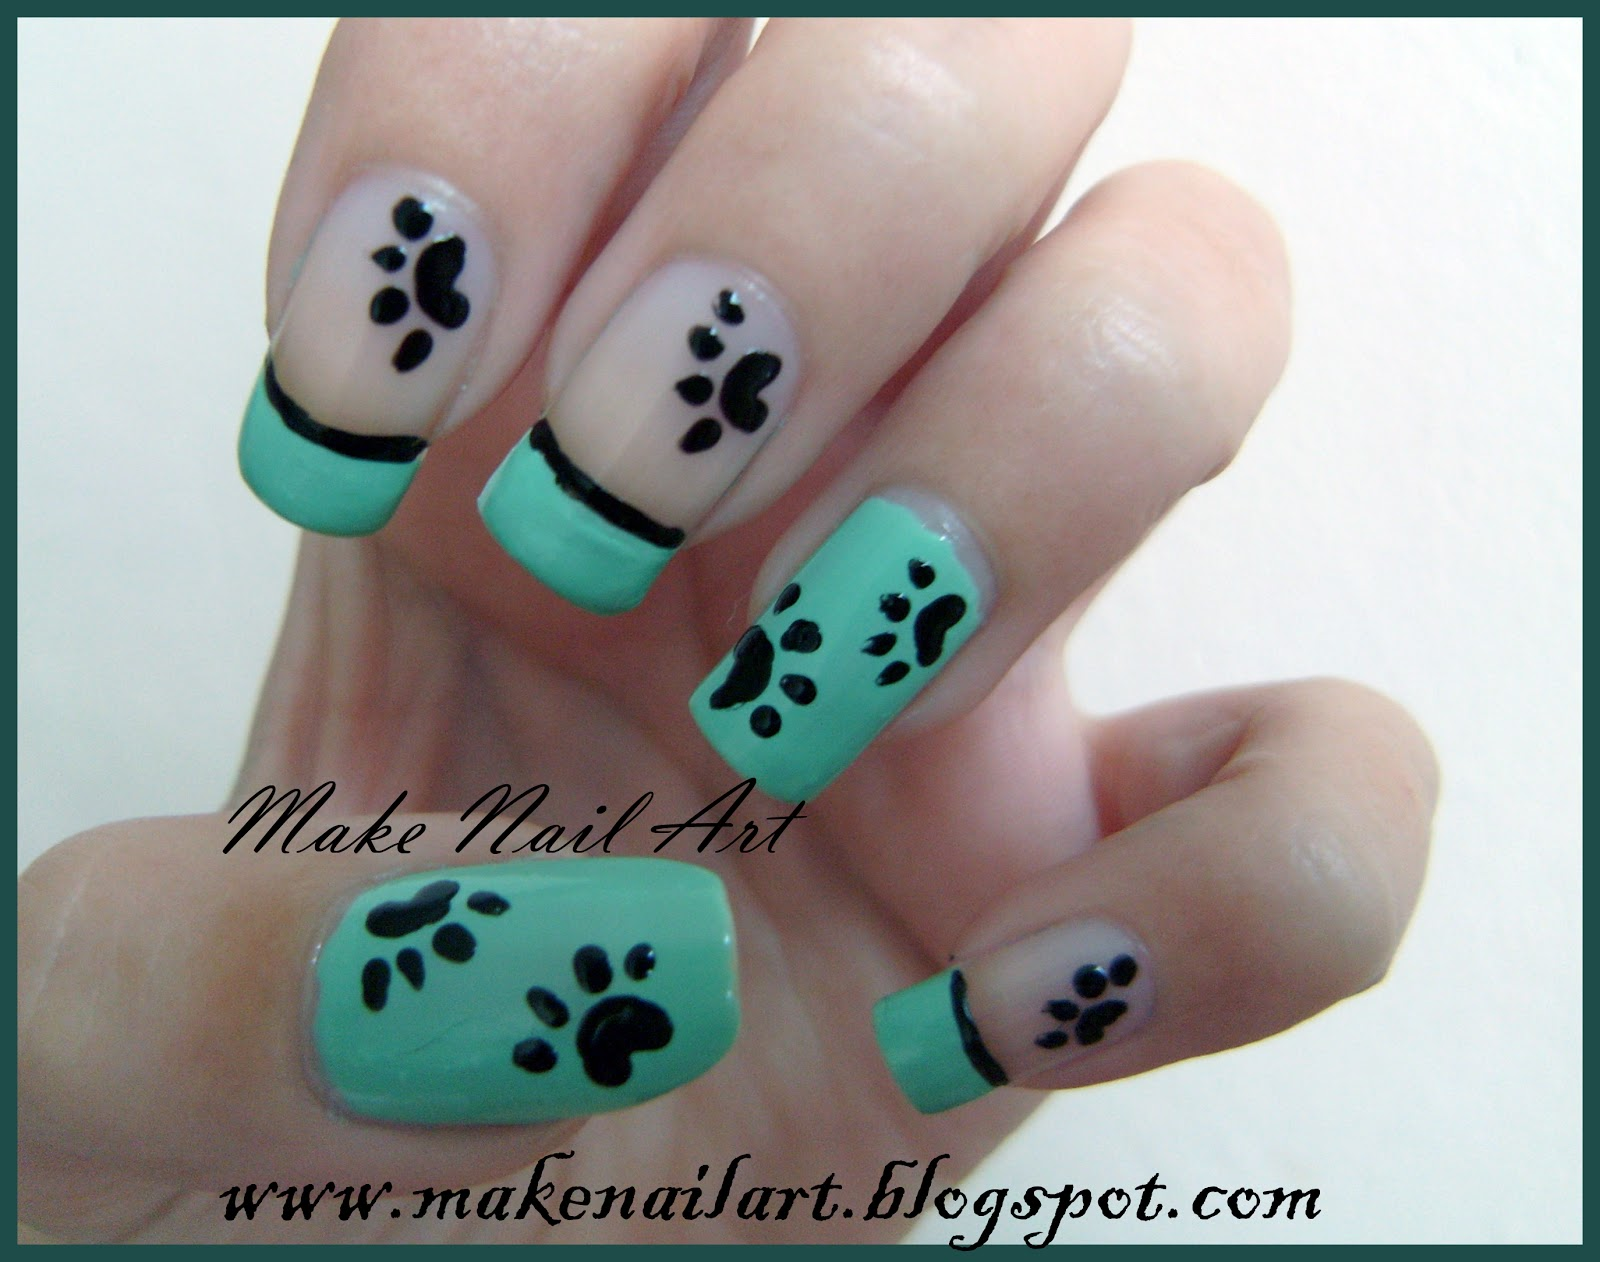 Make nail art simple and cute paws nail art tutorial